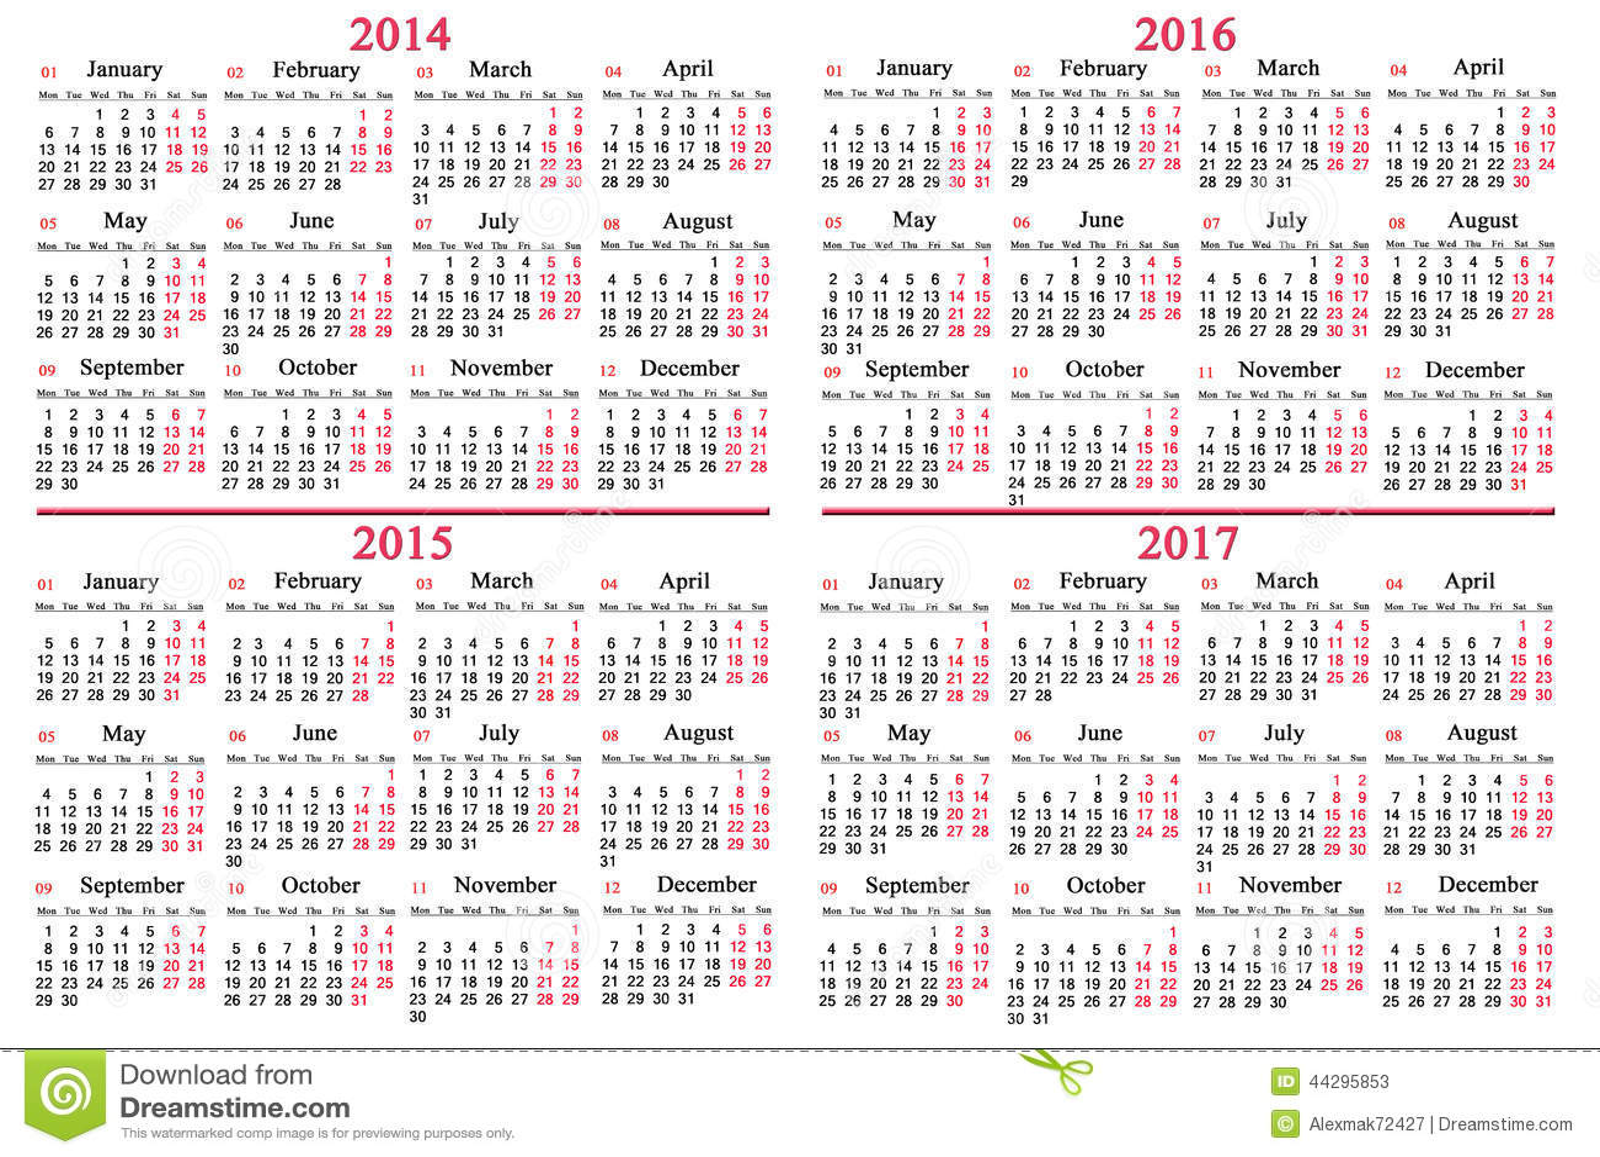 October calendar events 2017 free download